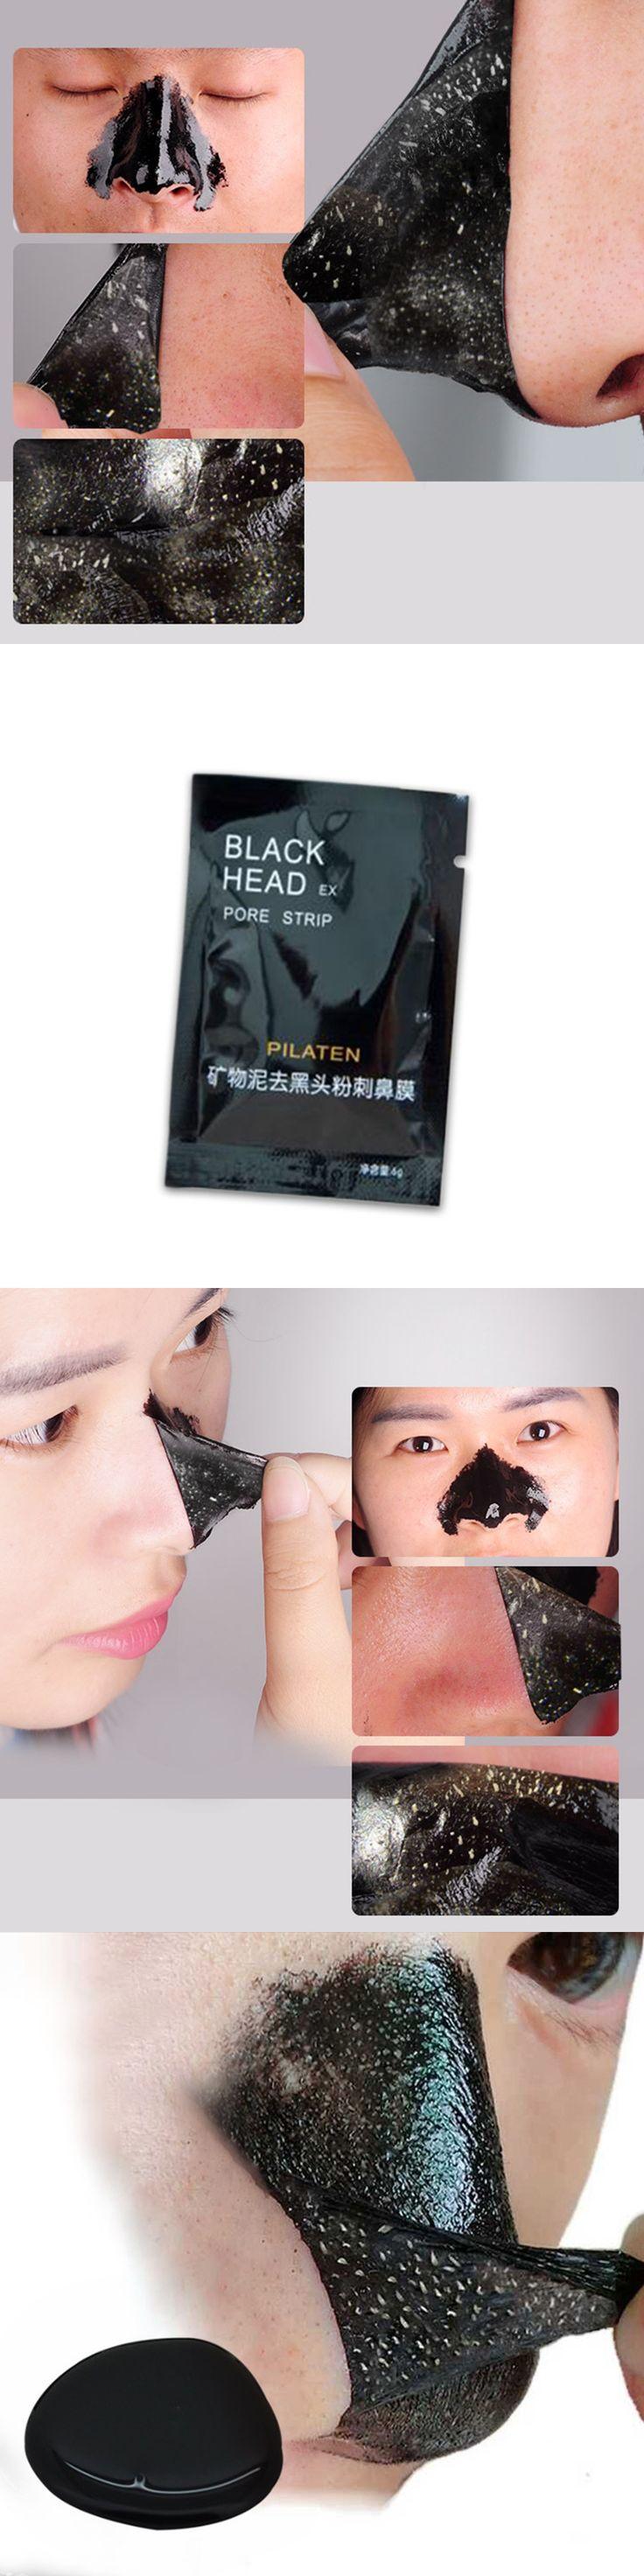 Pilaten brand blackhead remover T district nursing black mud to blackhead nose mask black head black mask Pore Strip make up